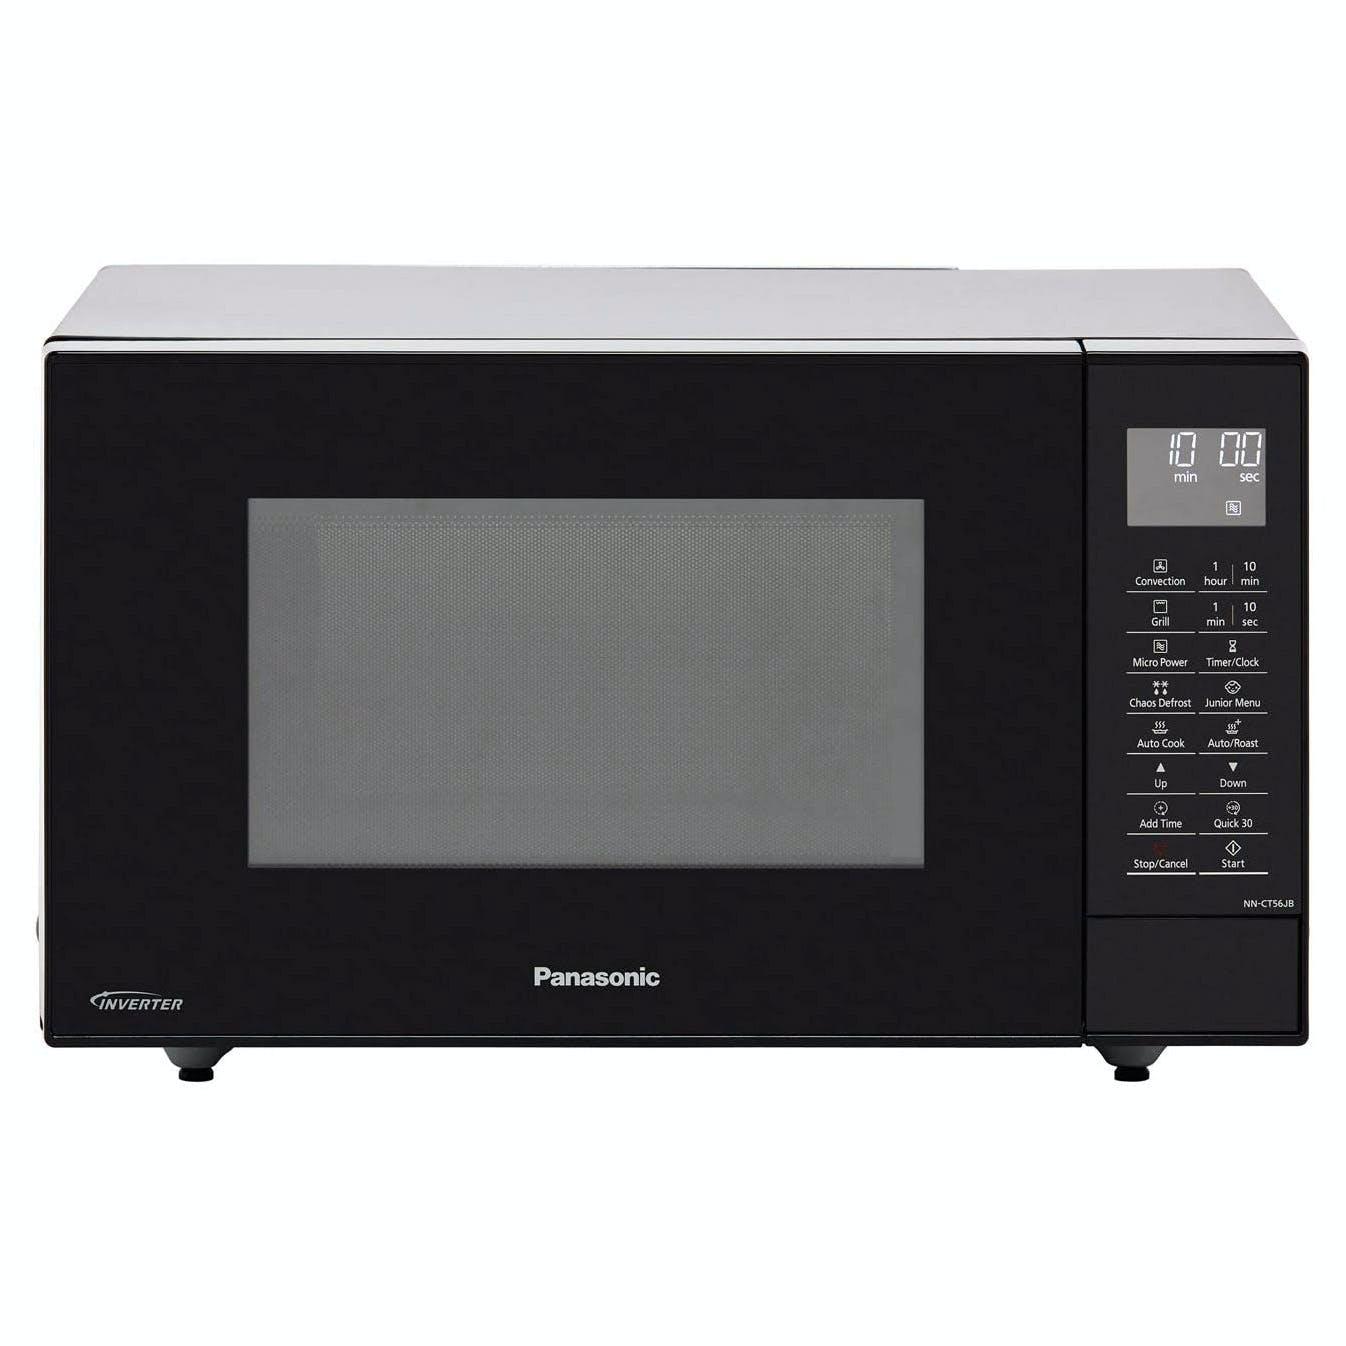 Panasonic NN-CT56JBBPQ Combination Microwave Oven in Black